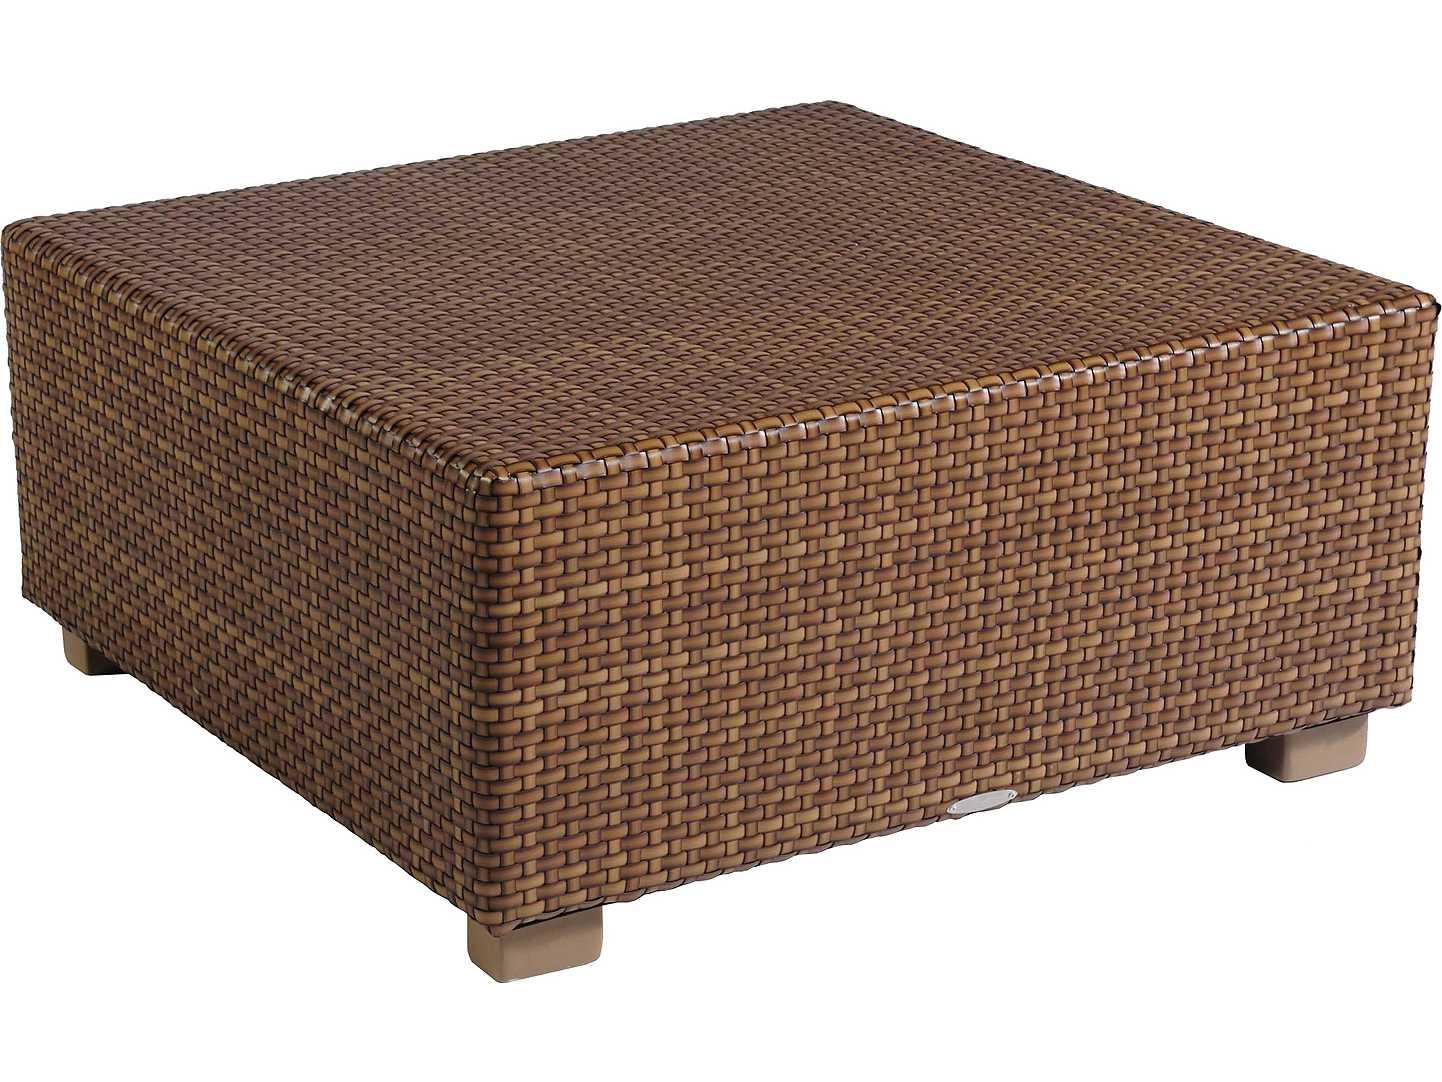 Whitecraft Sedona Wicker 36 Square Coffee Table S631211